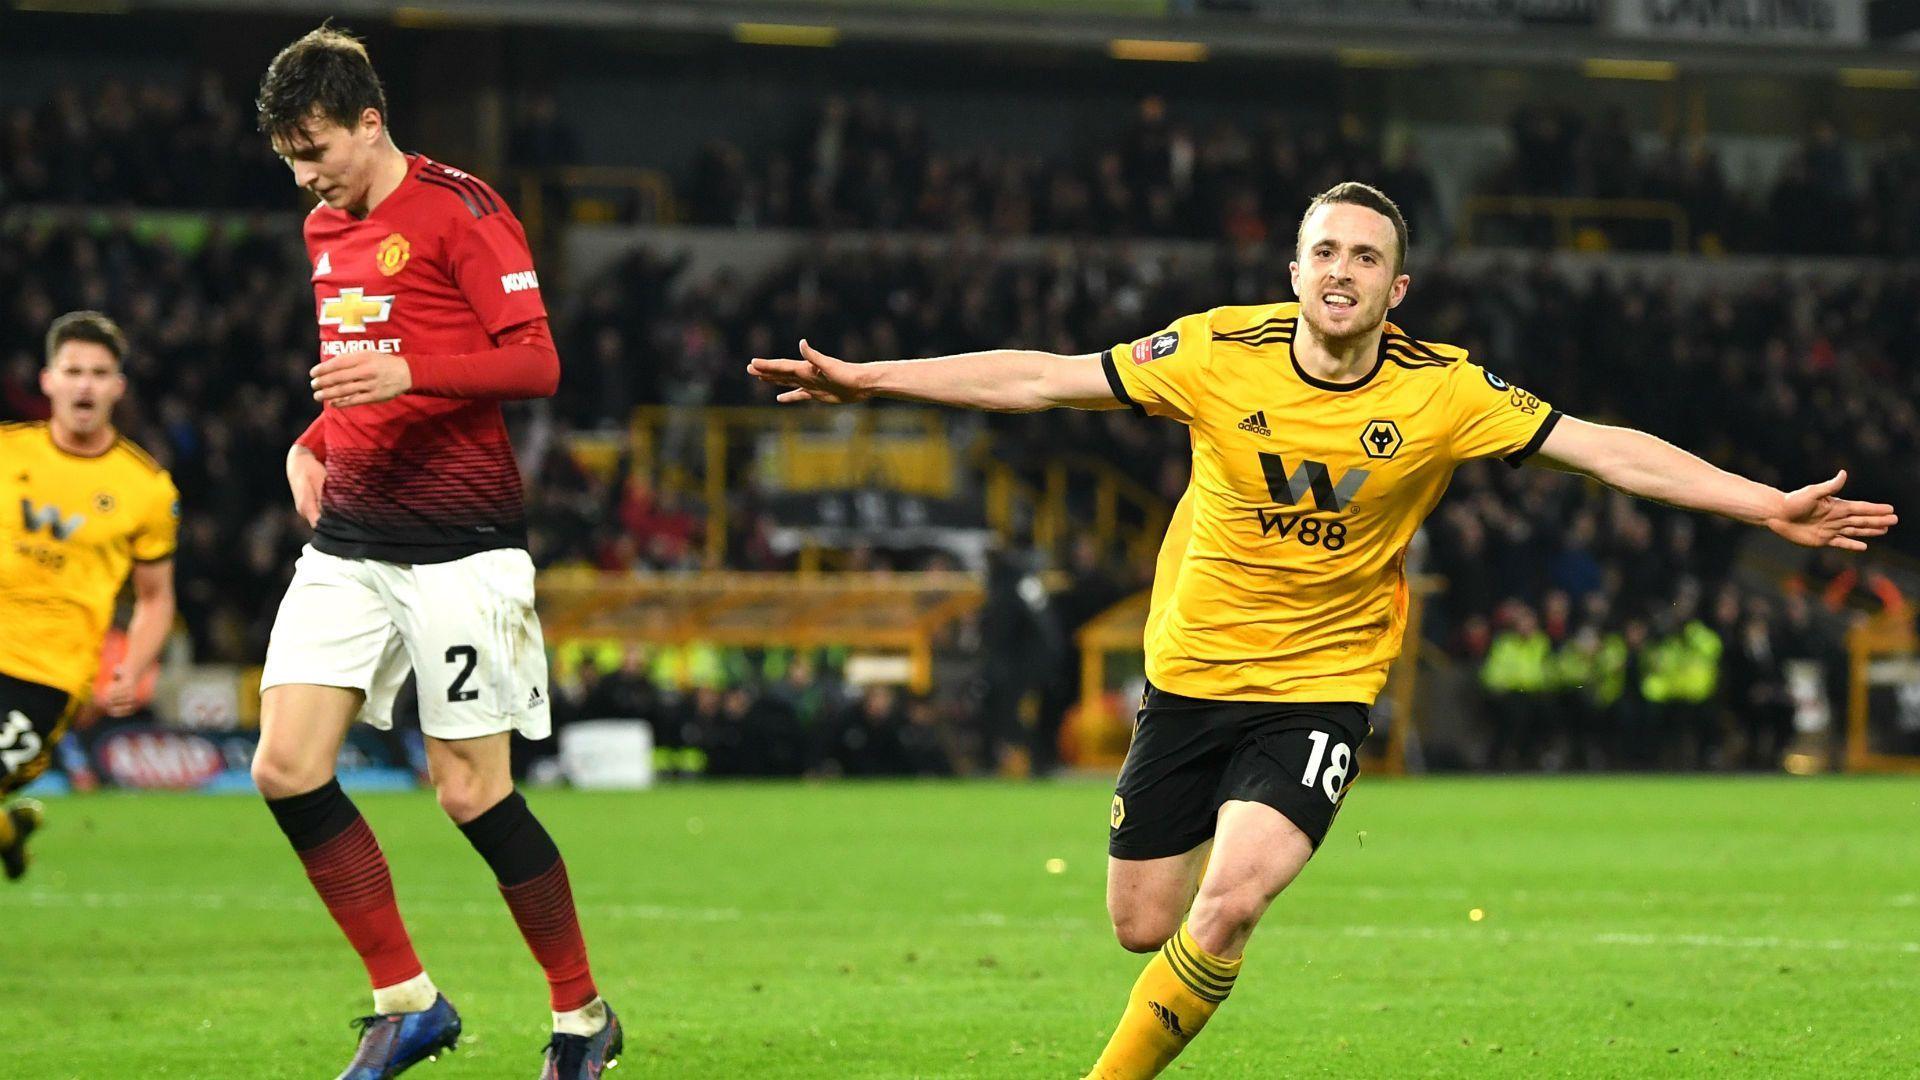 Wolverhampton Wanderers vs Manchester United Highlights